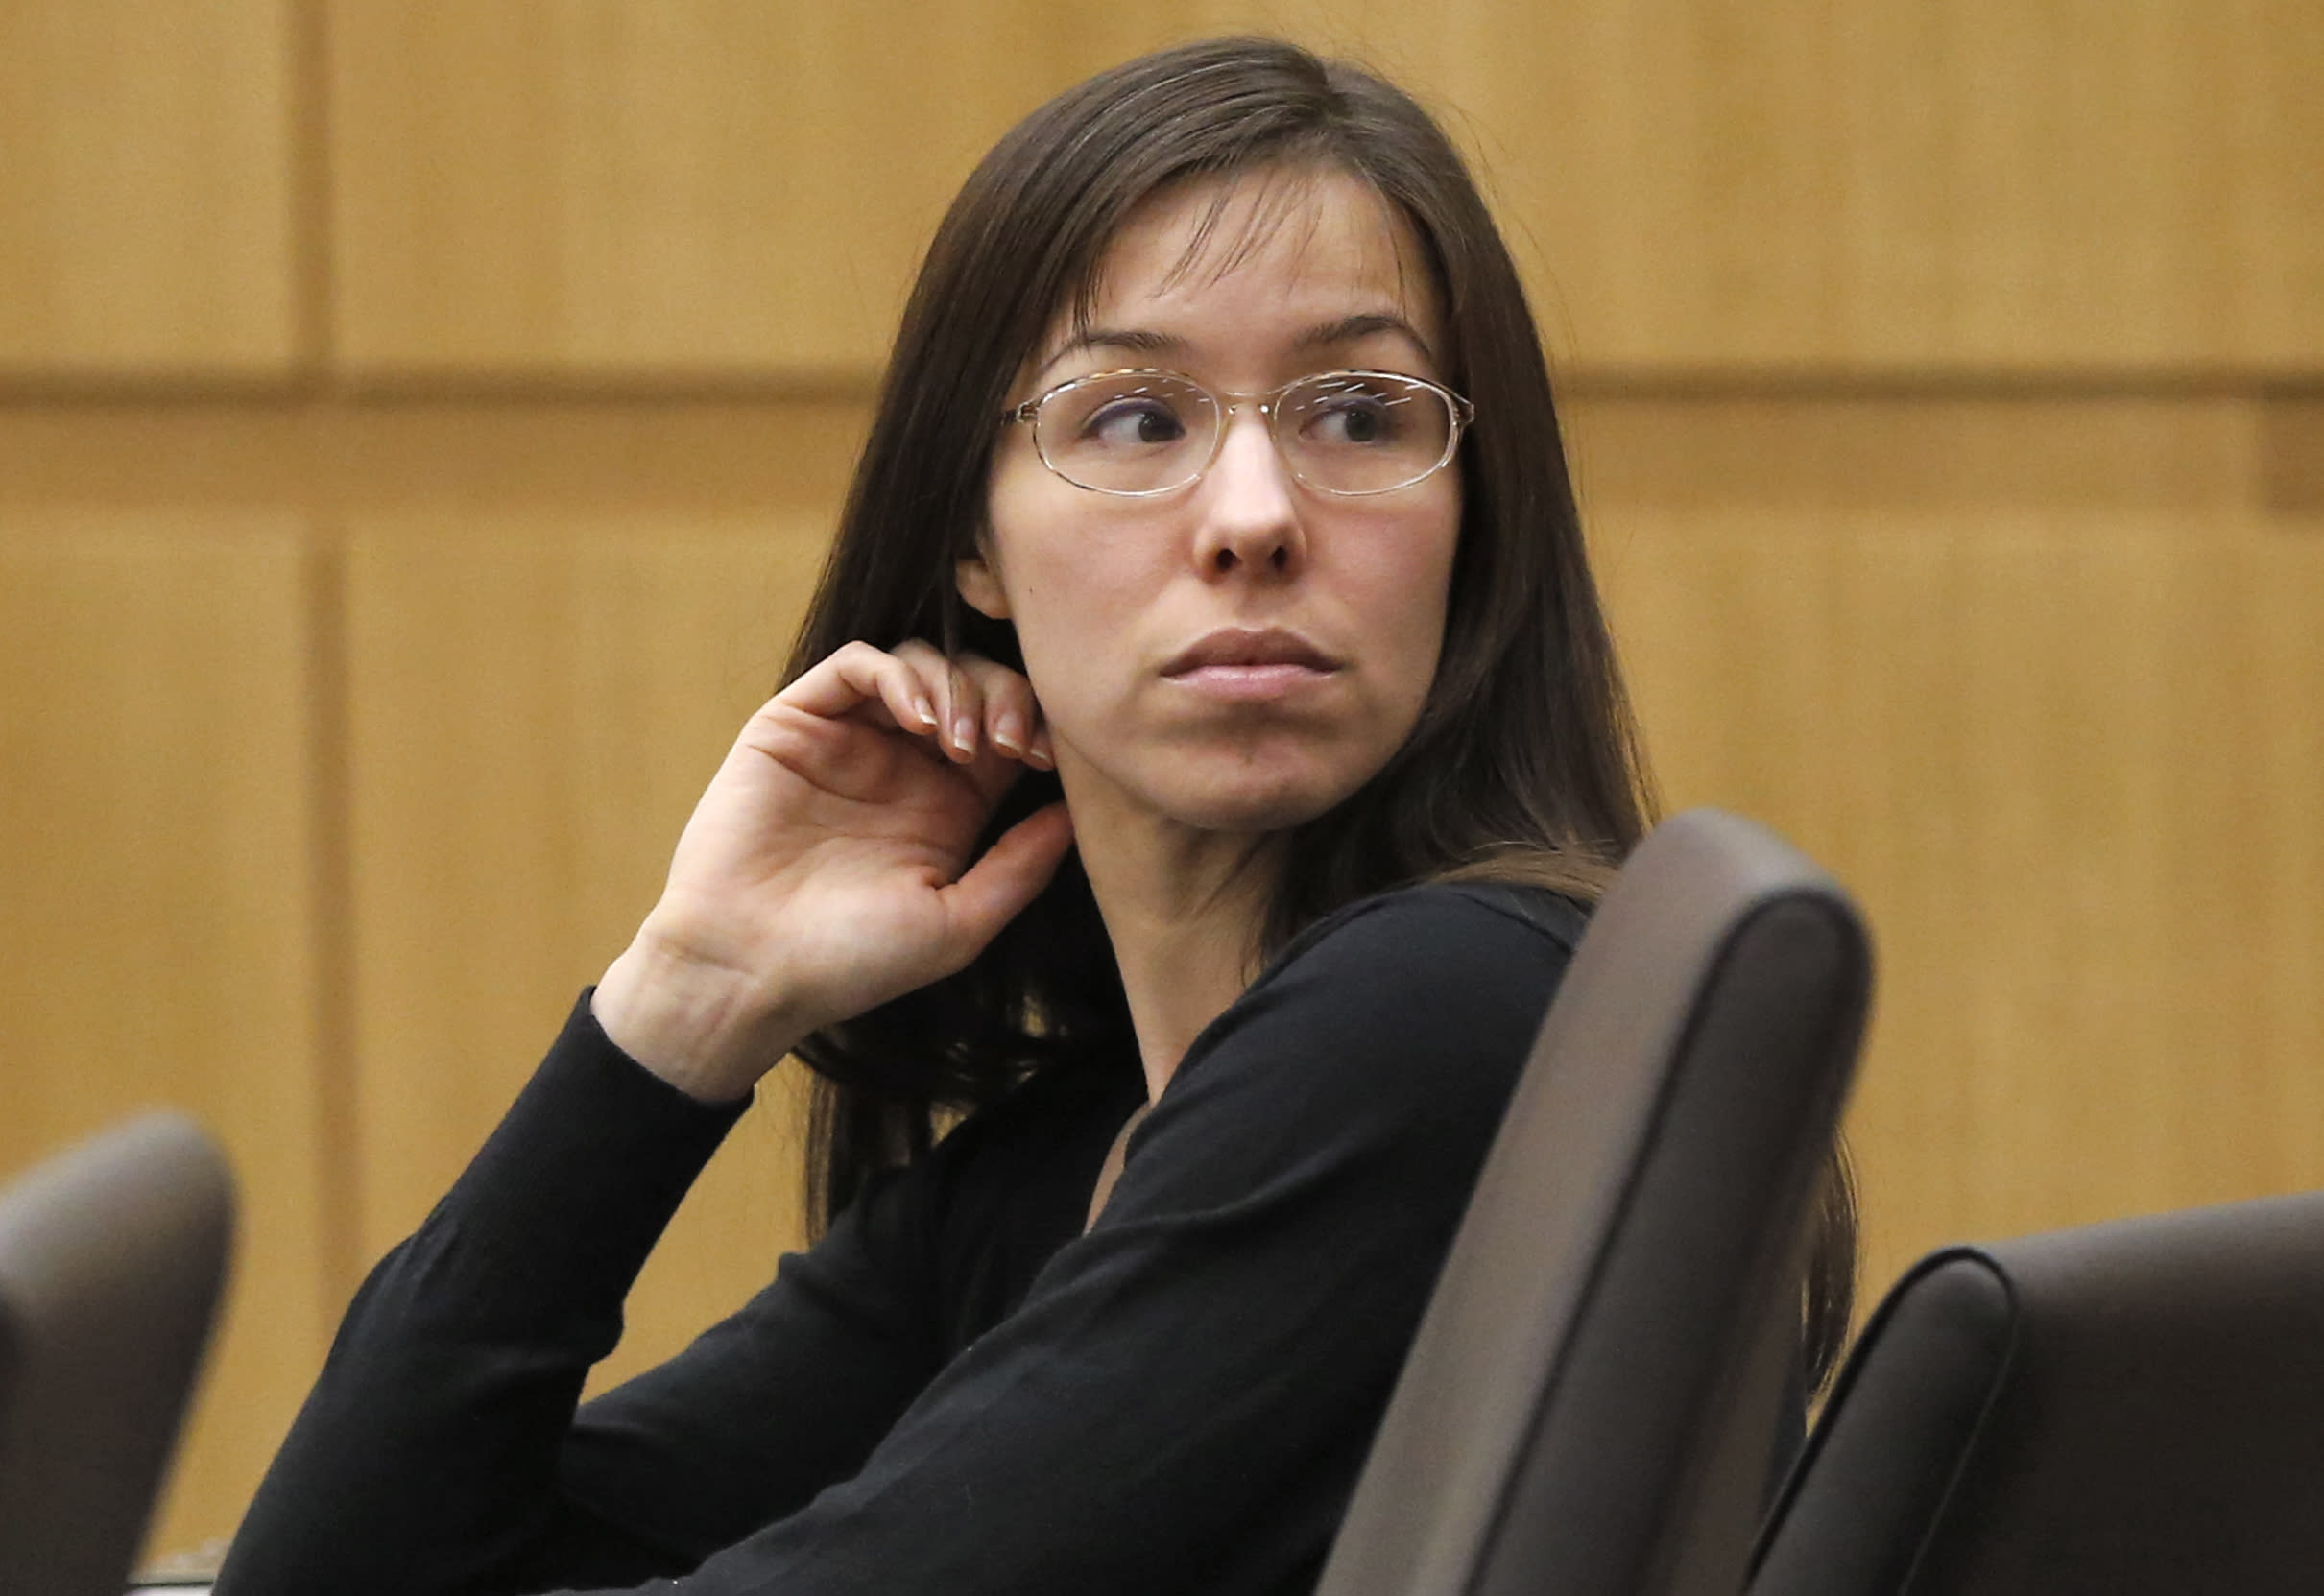 Jodi arias the killer's kinky plan to frame her victim